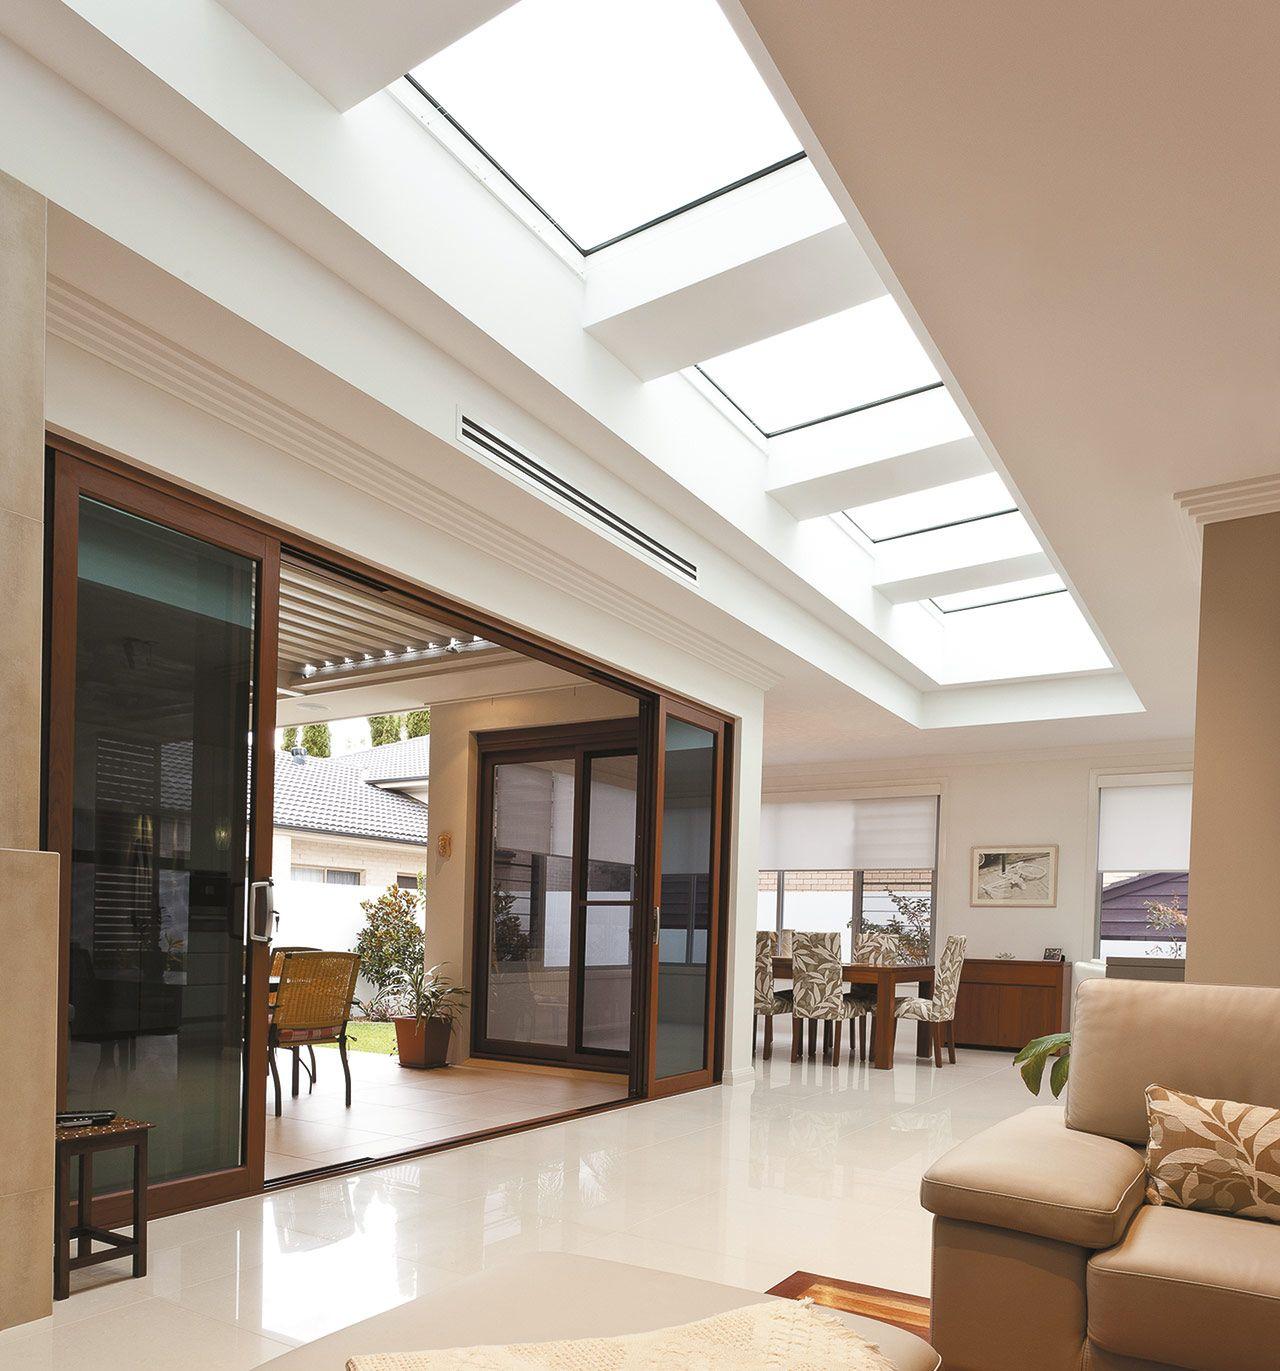 Astonishing Fantastic Skylights In Dwelling Room Star Adorning Https Hometoz Com Fantastic Skyl Flat Roof Skylights Skylight Living Room Skylight Design